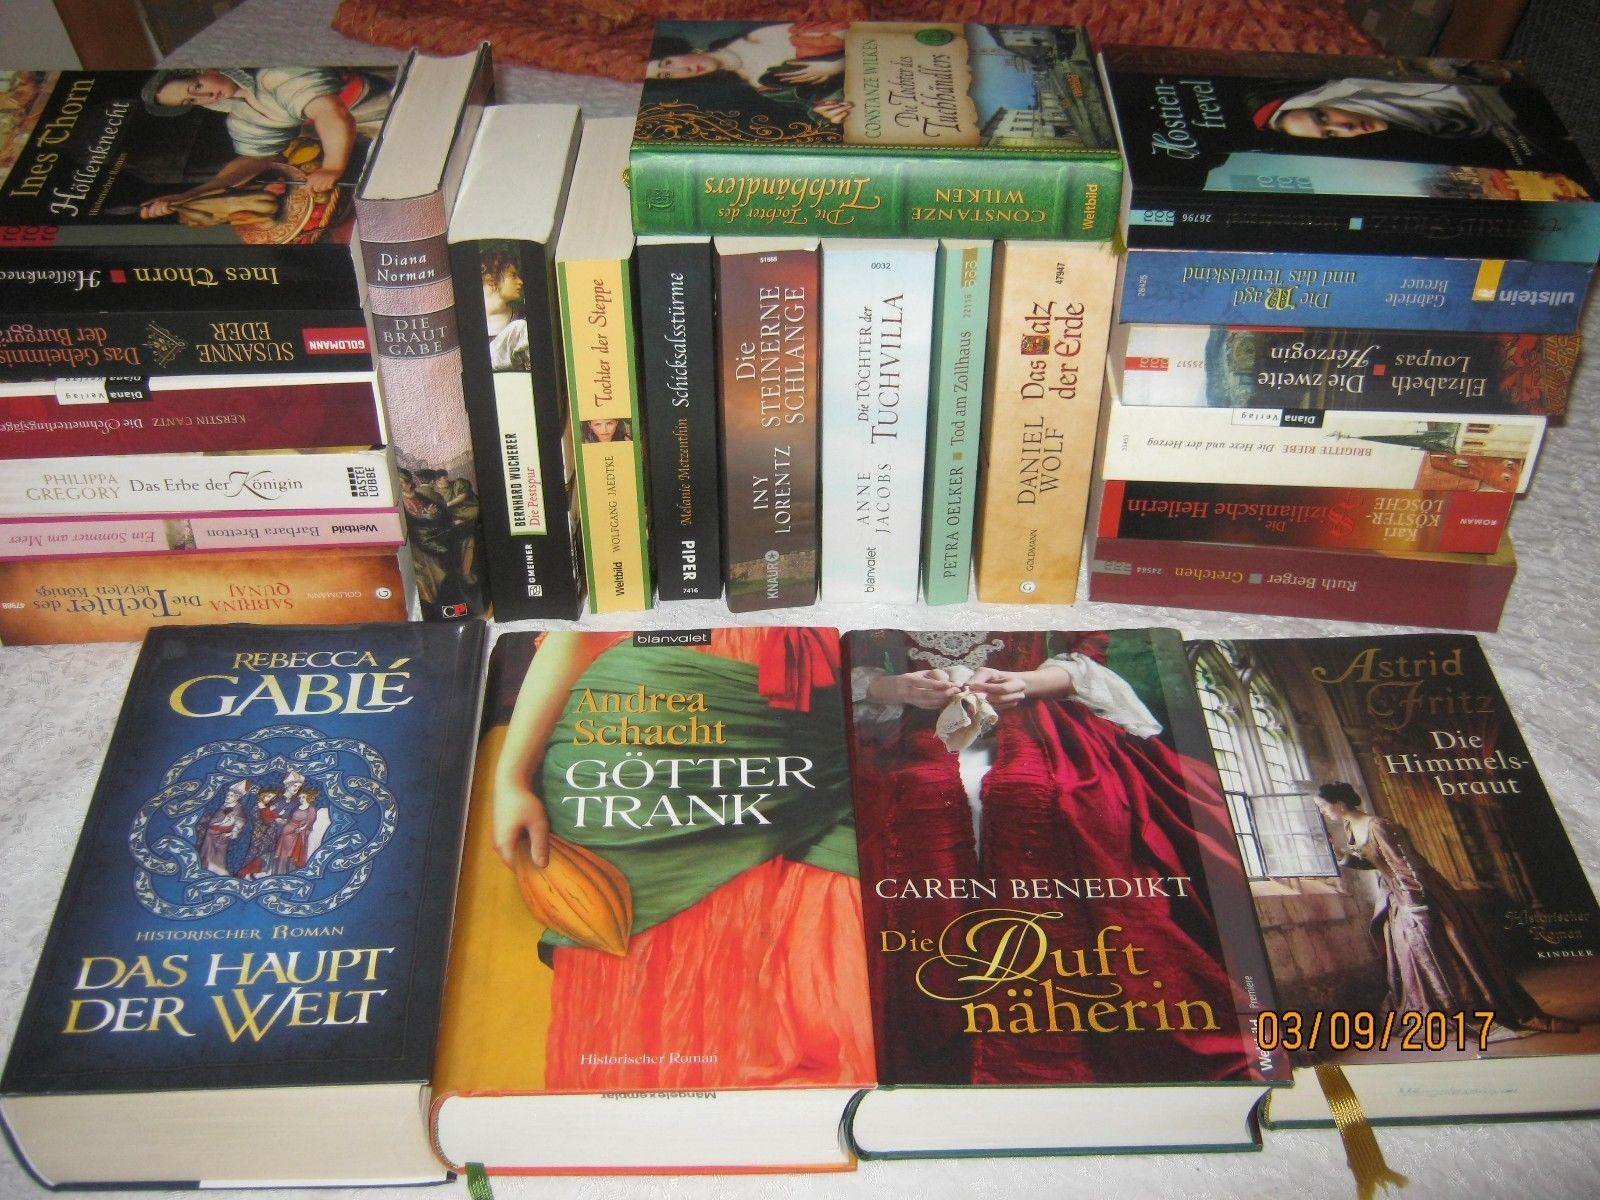 25 Historische Romane Konvolut Bekannter Autoren Iny Lorentz Andrea Schacht usw